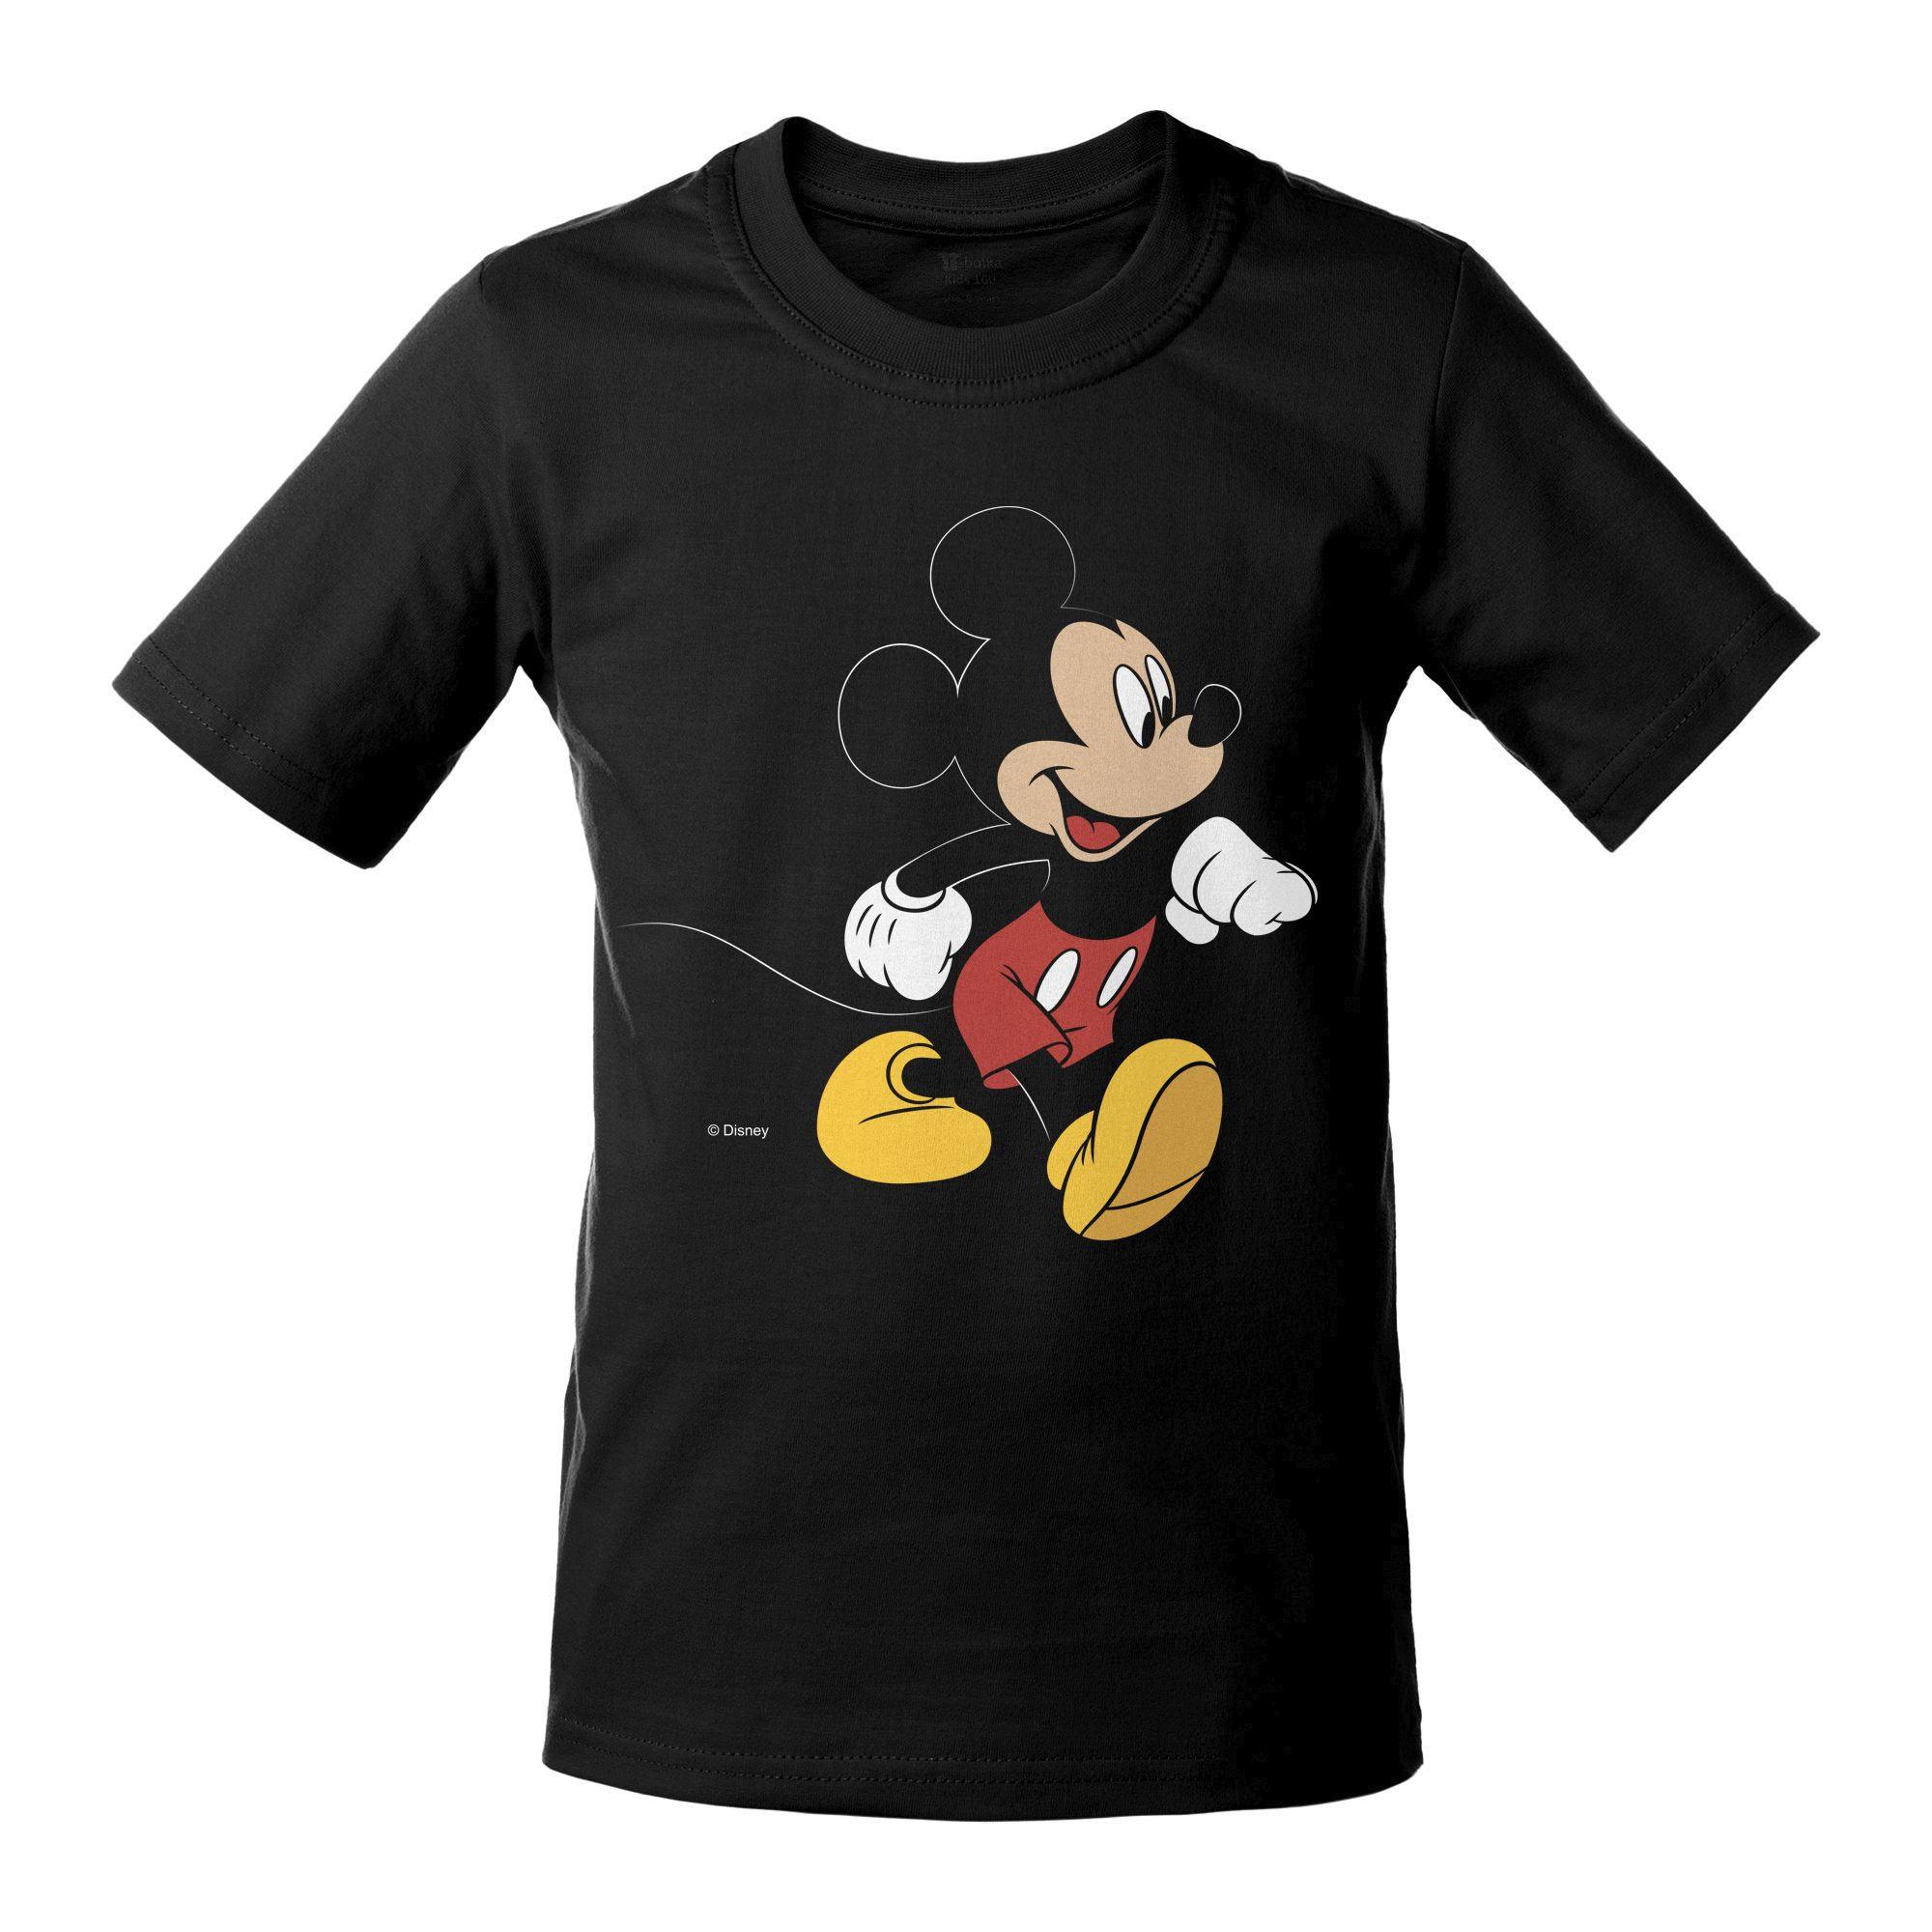 Футболка детская «Микки Маус. Easygoing», черная арт 55532.31